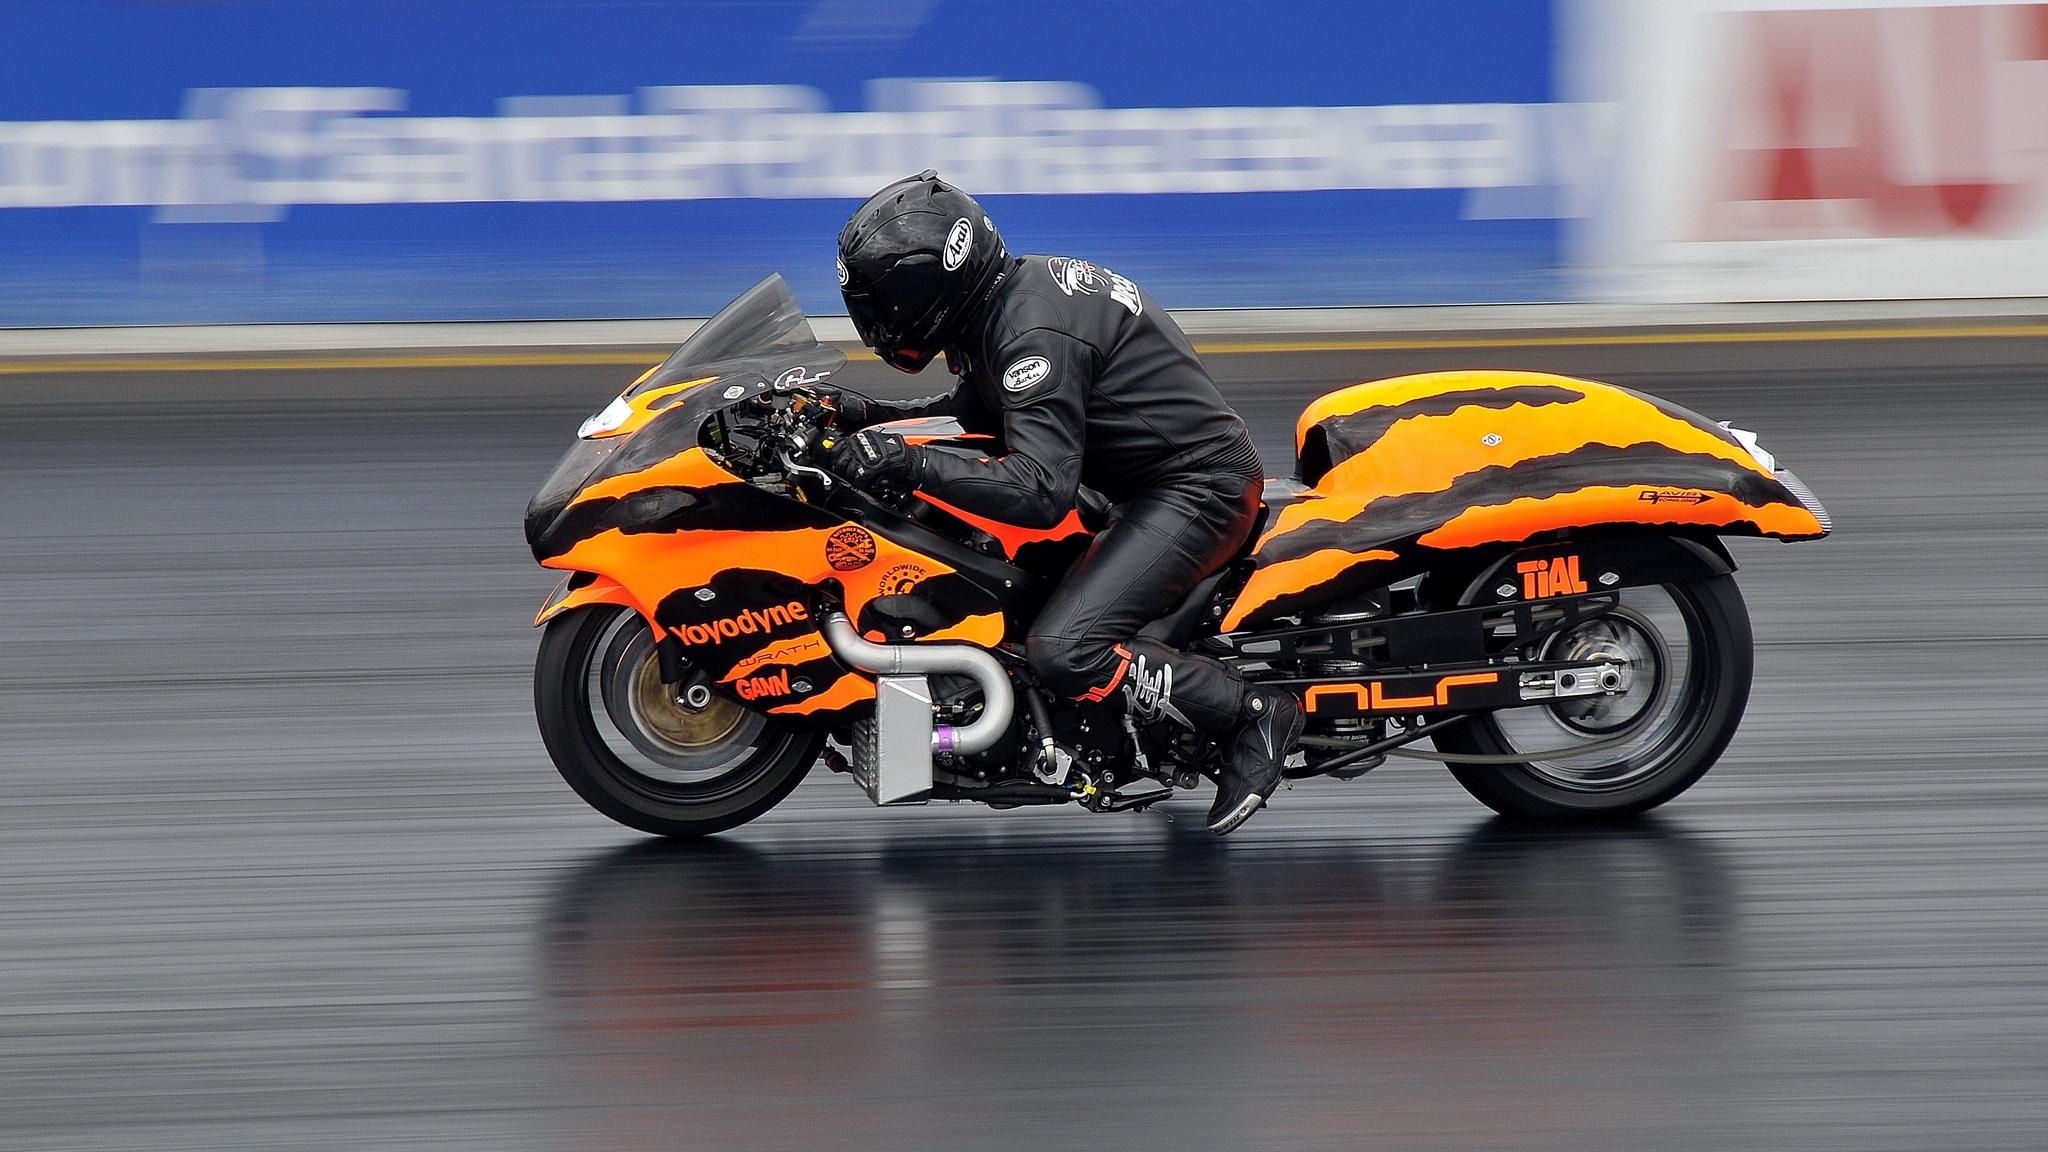 Download wallpaper 2048x1152 motorcycle bike racing sports 2048x1152